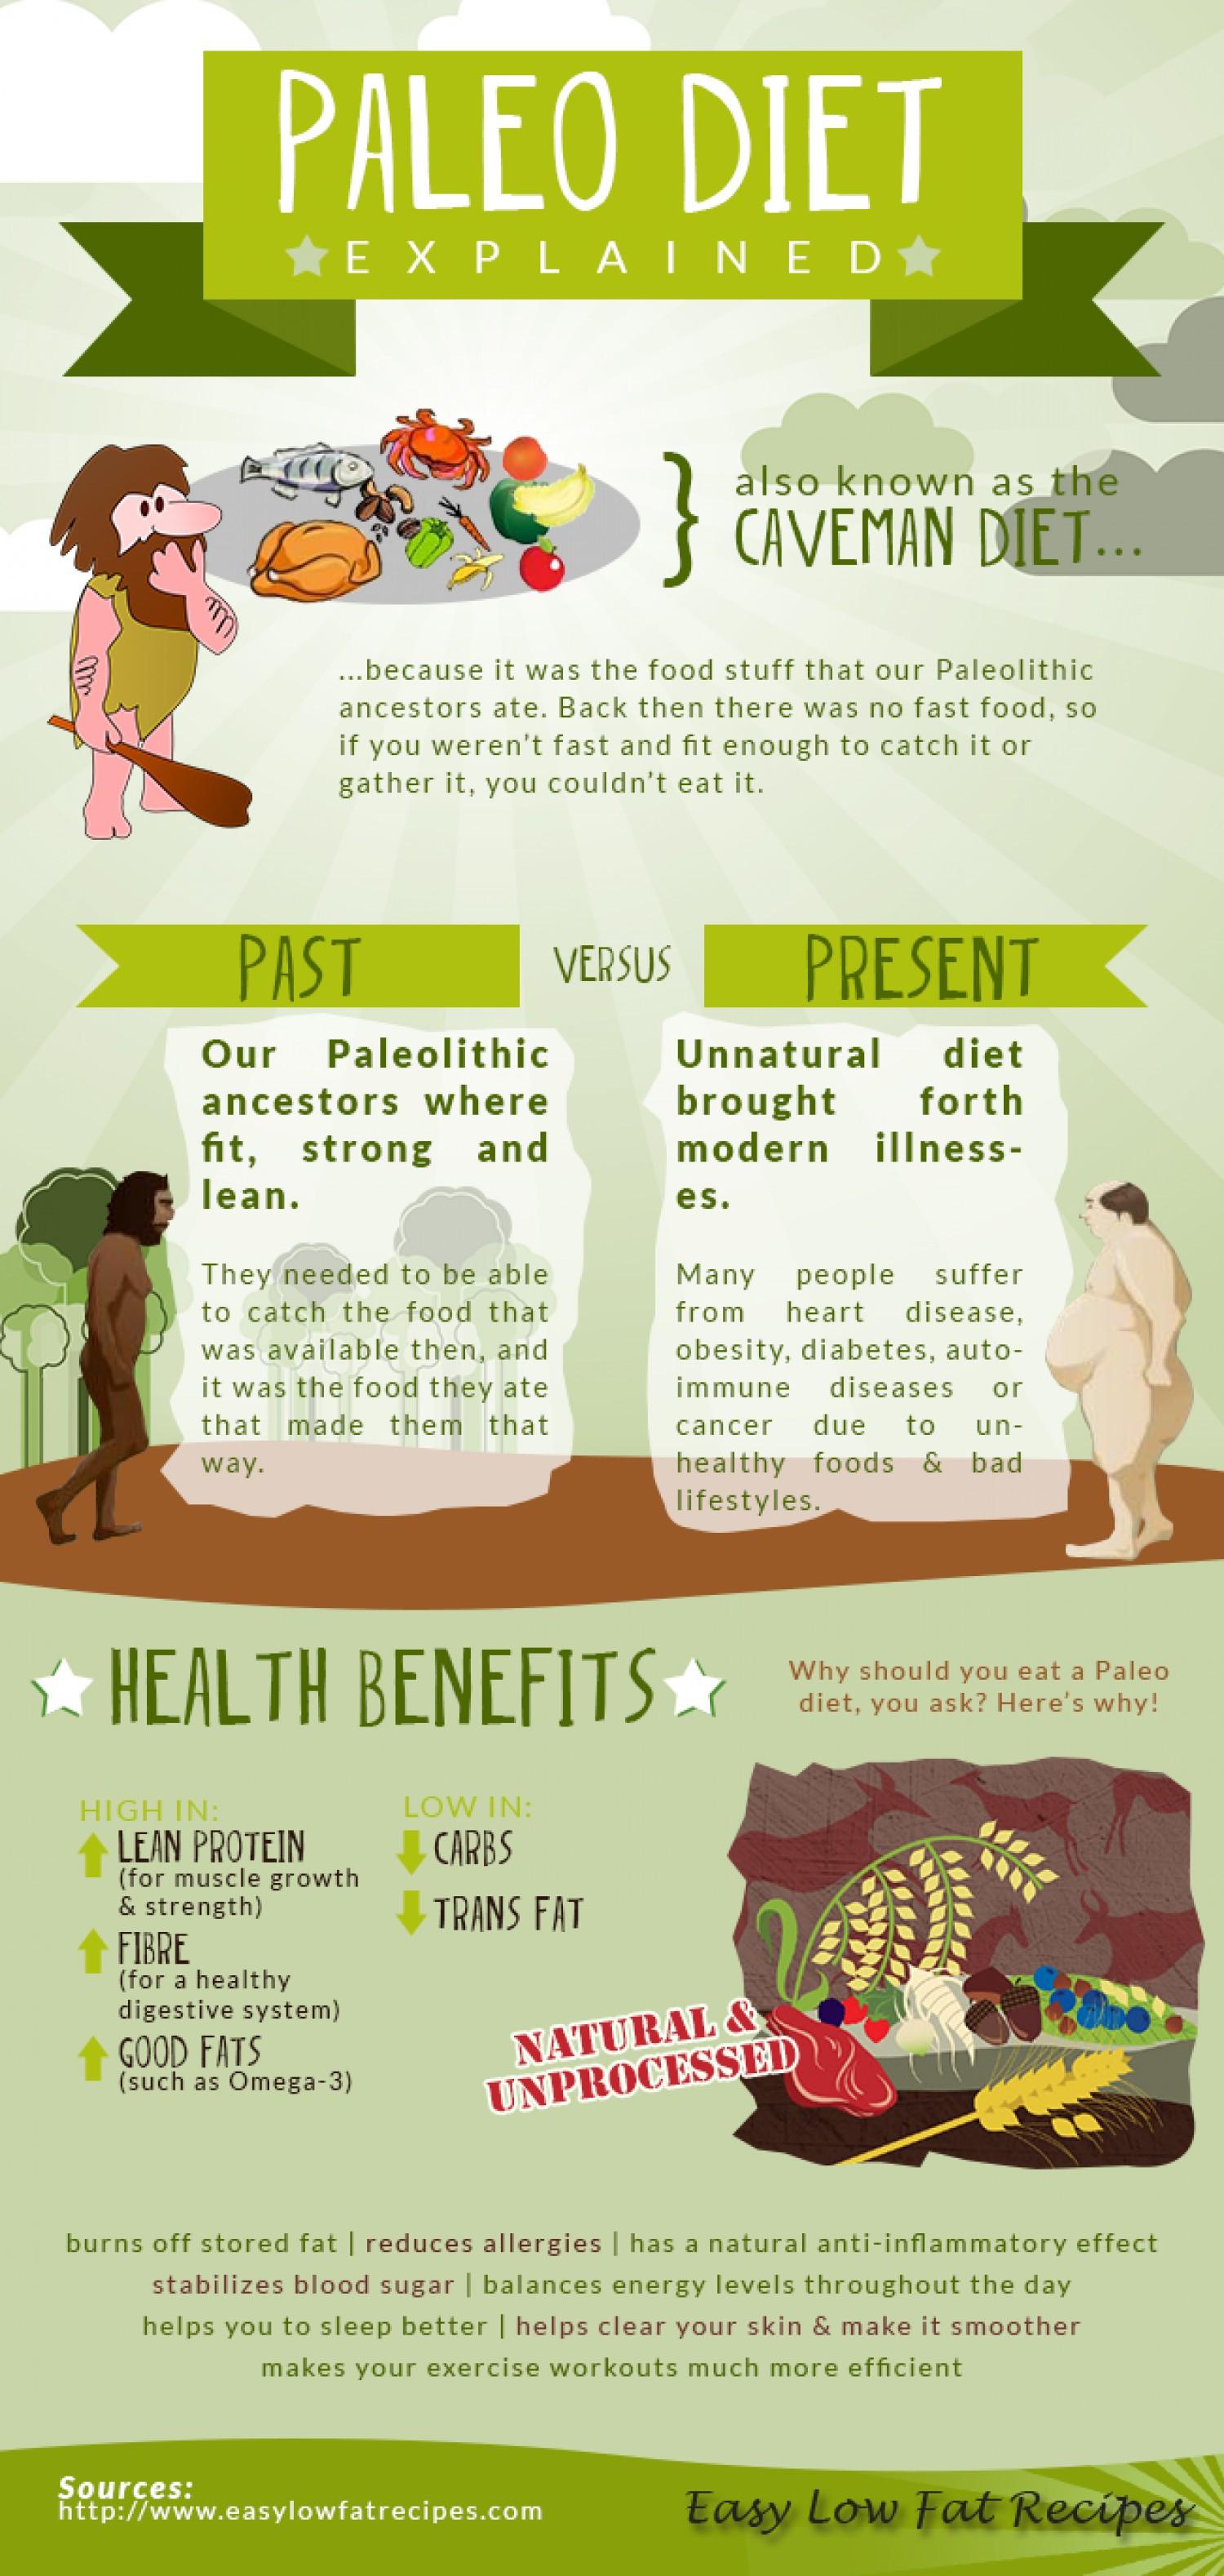 Paleo Diet Benefits  Paleo Diet Explained